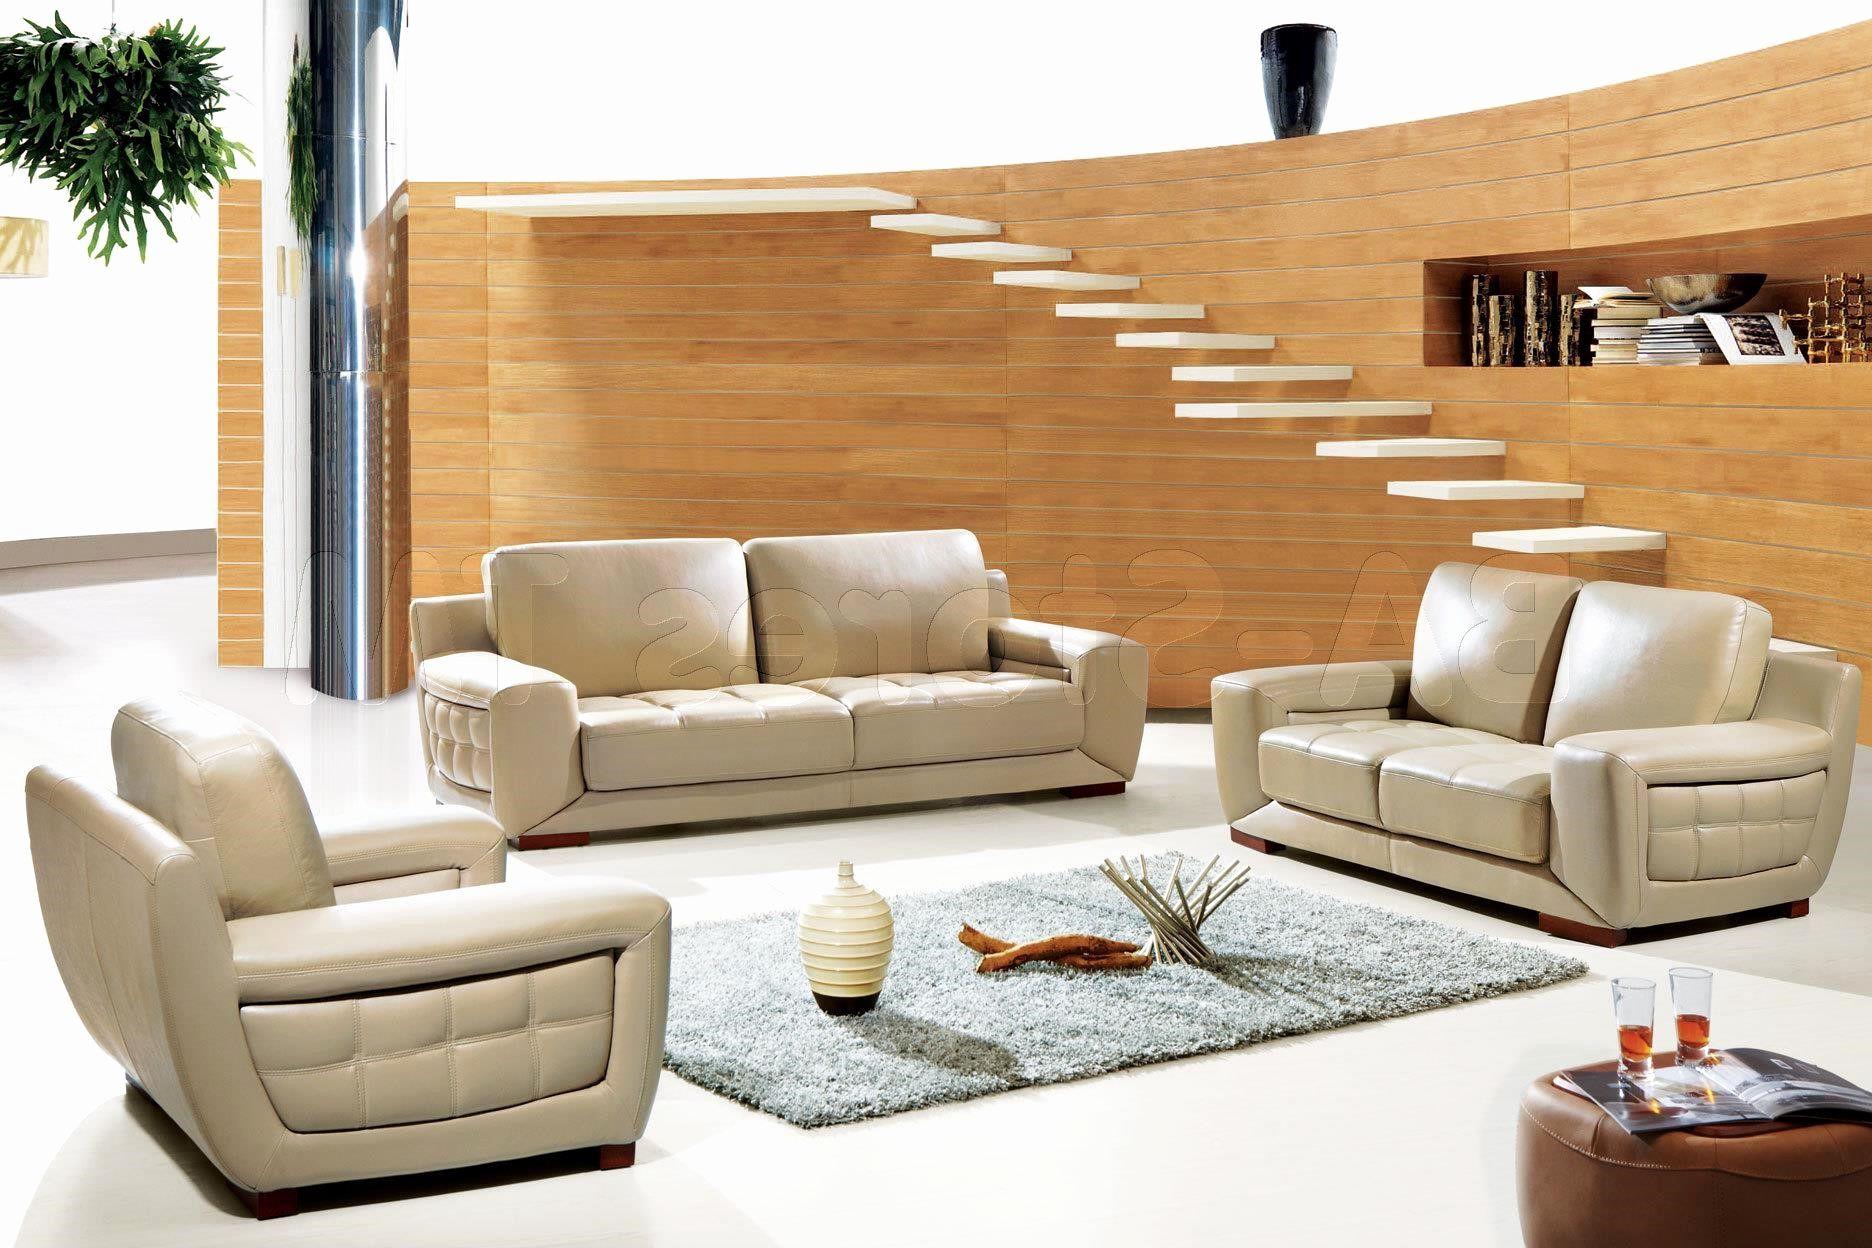 Best Of Home Sofa Set Designs Shot Home Sofa Set Designs Best Of